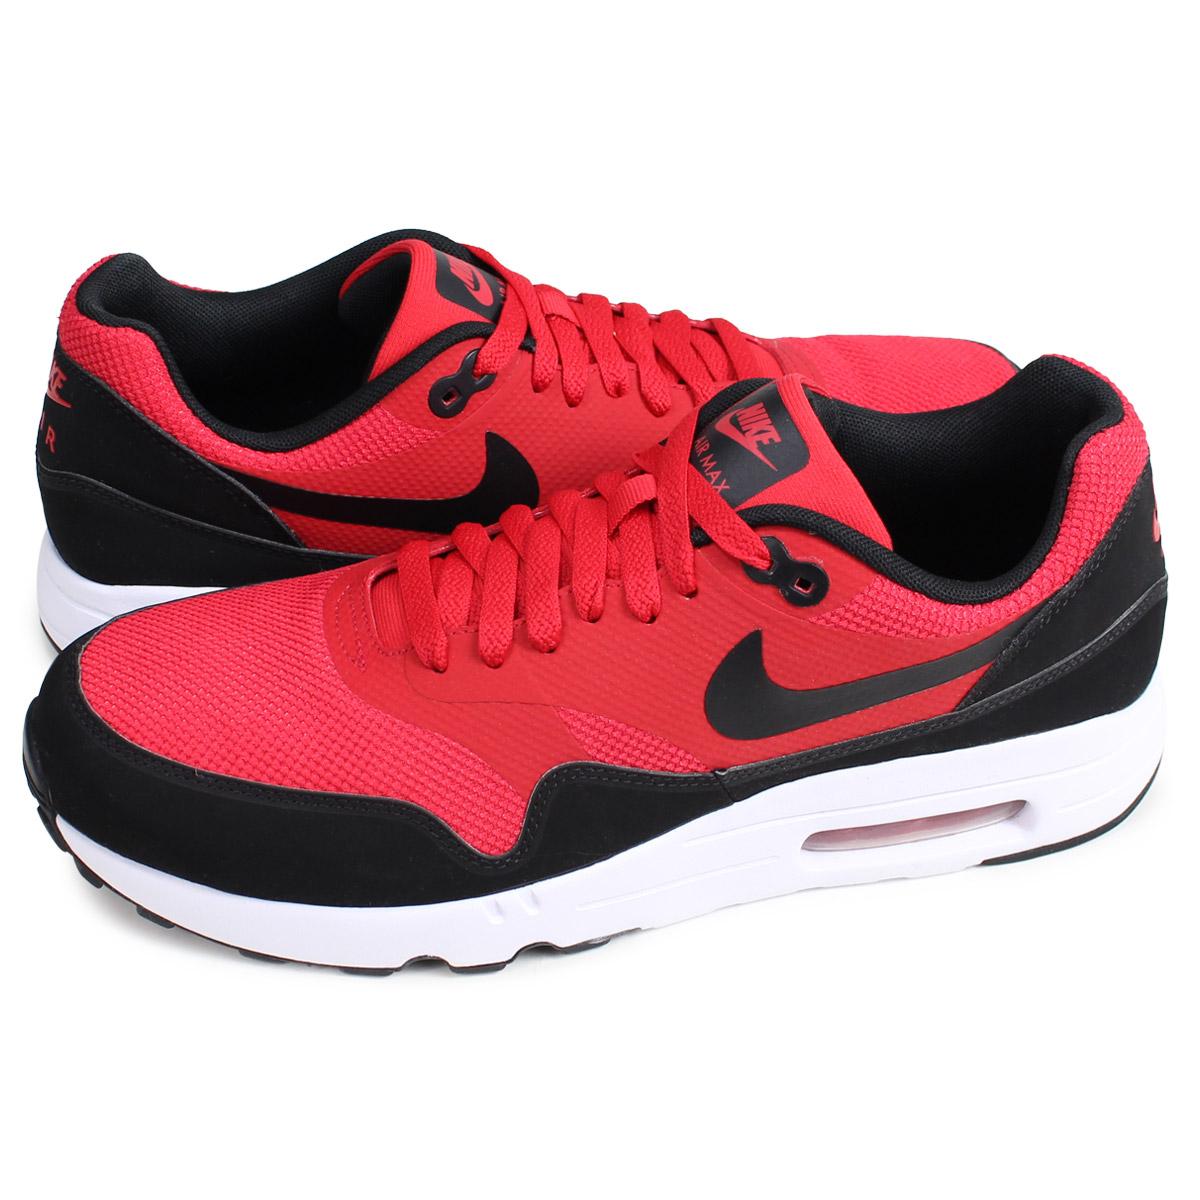 Nike NIKE Air Max 1 essential sneakers men AIR MAX 1 ULTRA 2.0 ESSENTIAL red 875,679 600 [227 Shinnyu load] [192]